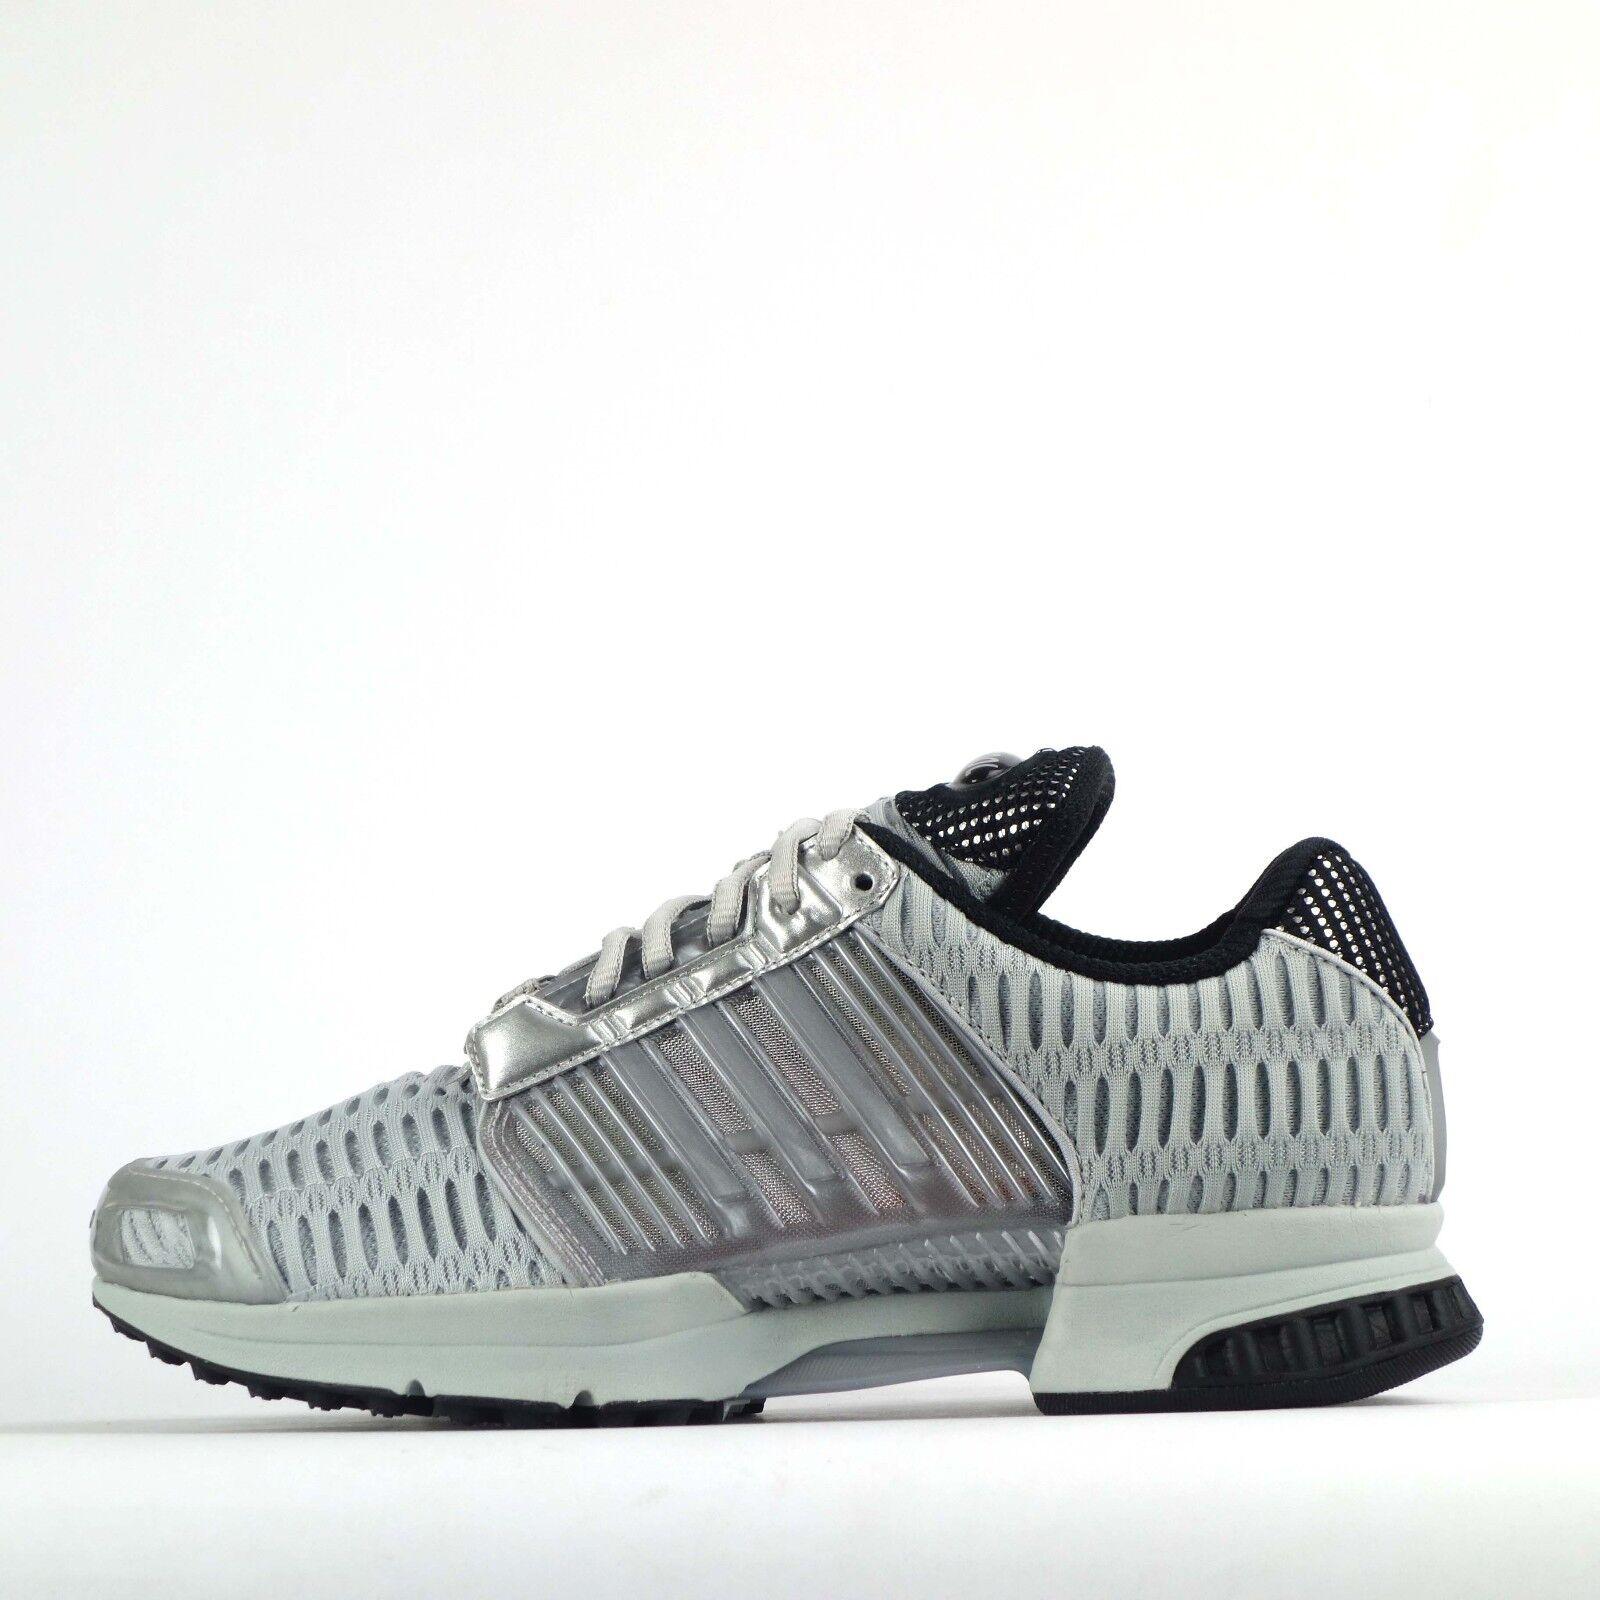 Adidas Originals Climacool 1 'Precious Metals' Mens Running Trainers shoes